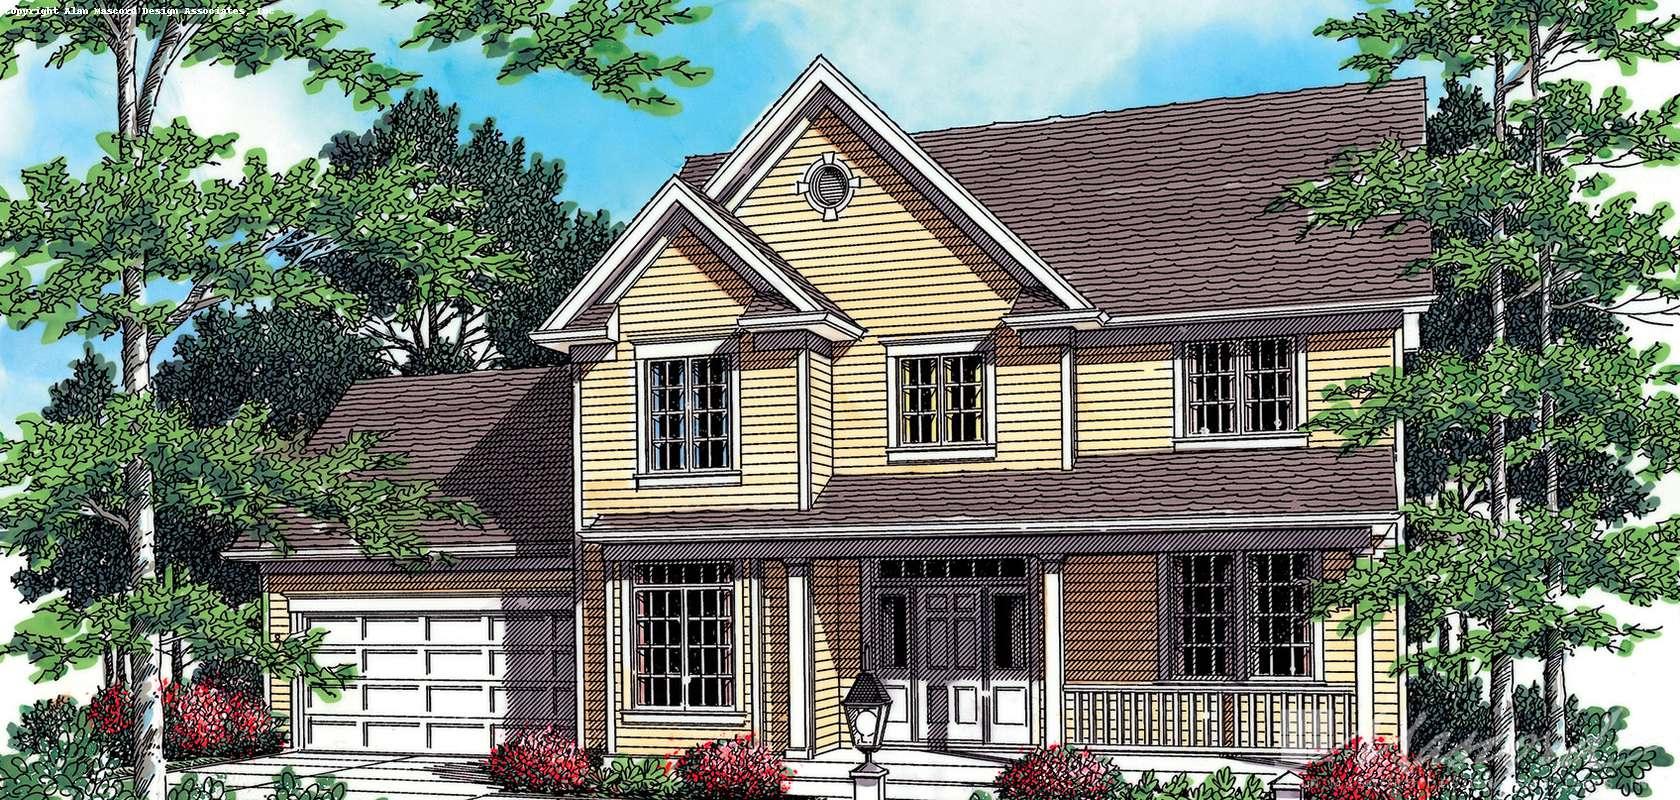 Mascord House Plan 22112: The Alexander